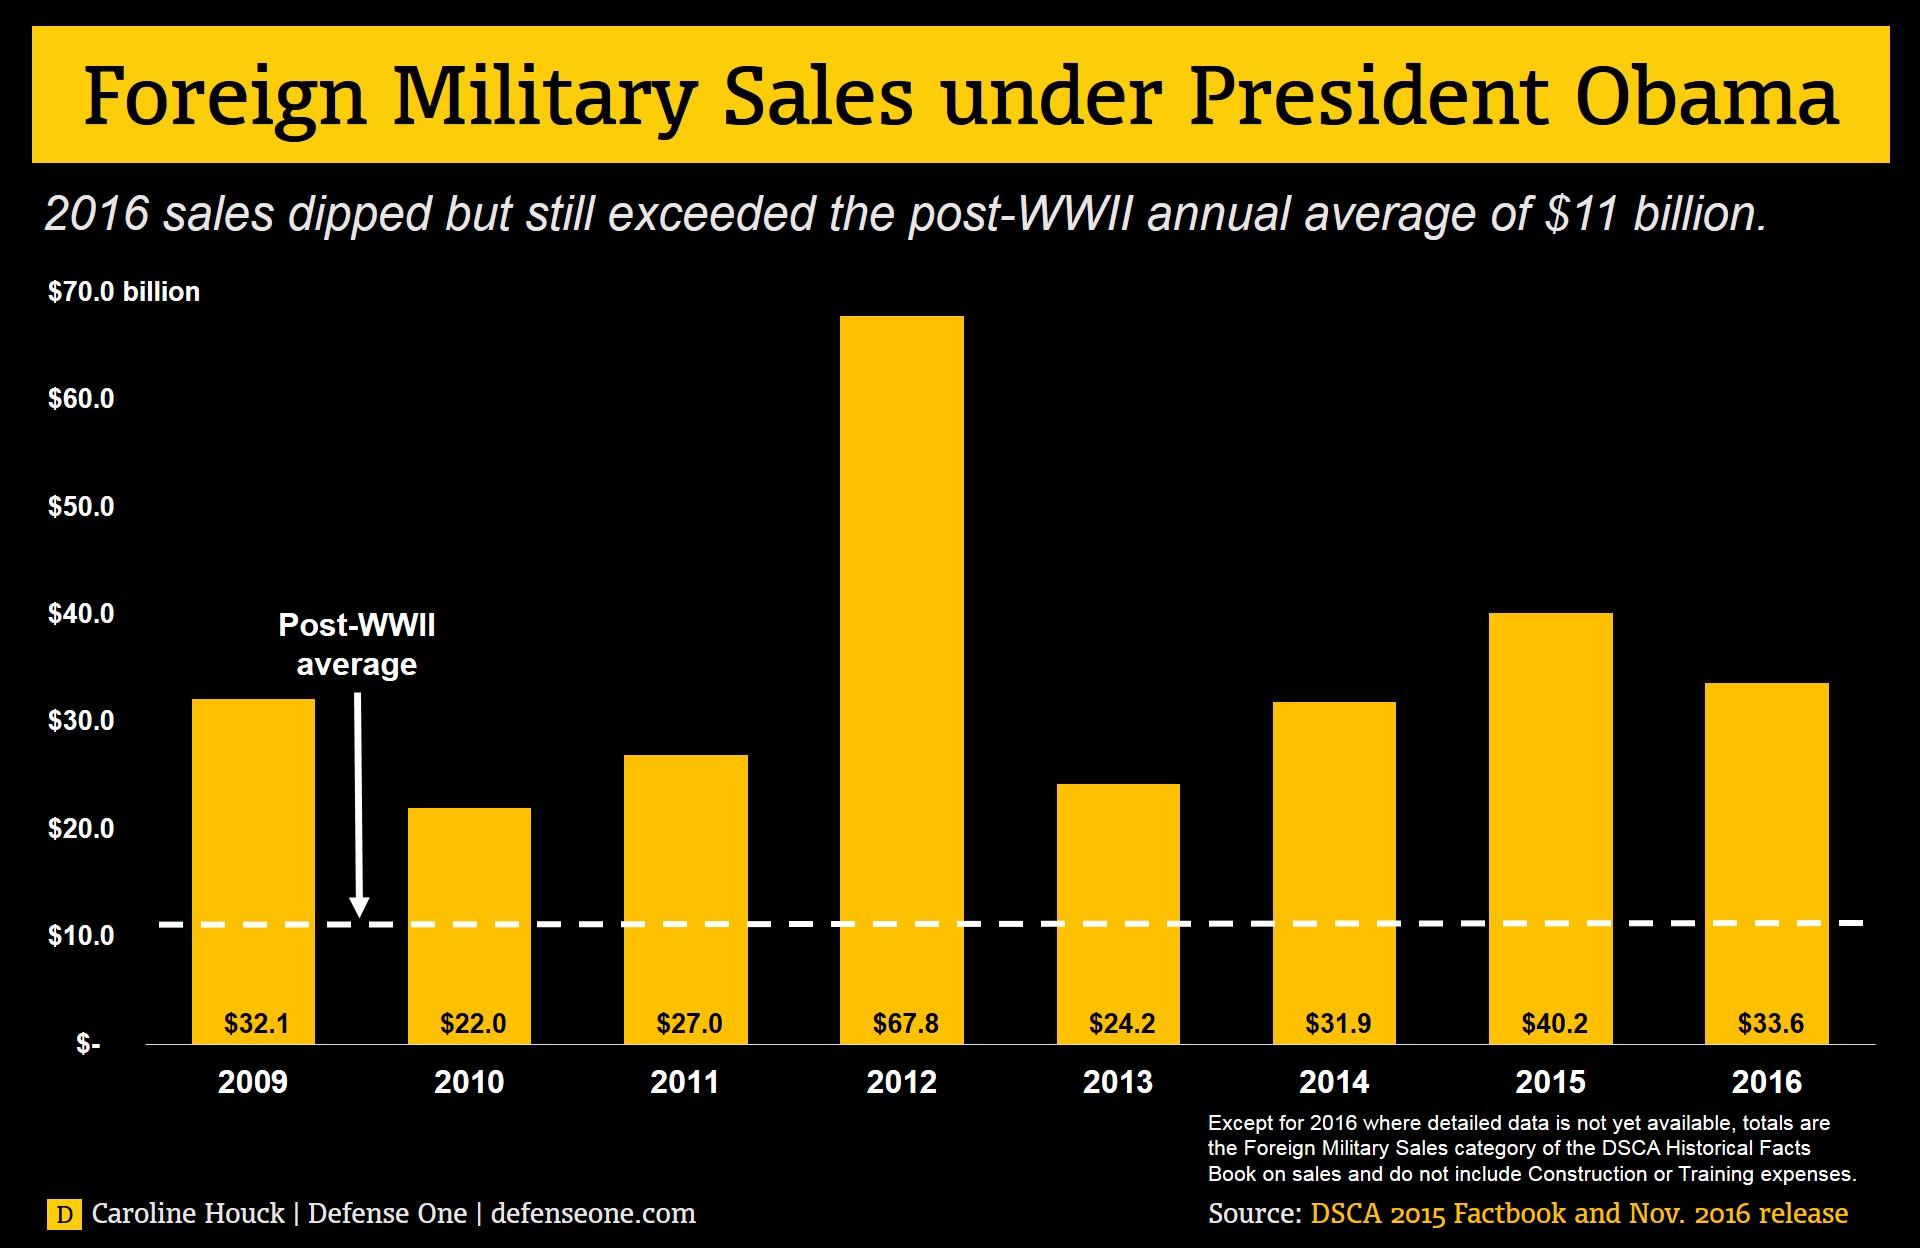 US Foreign Military Sales 3750730_original